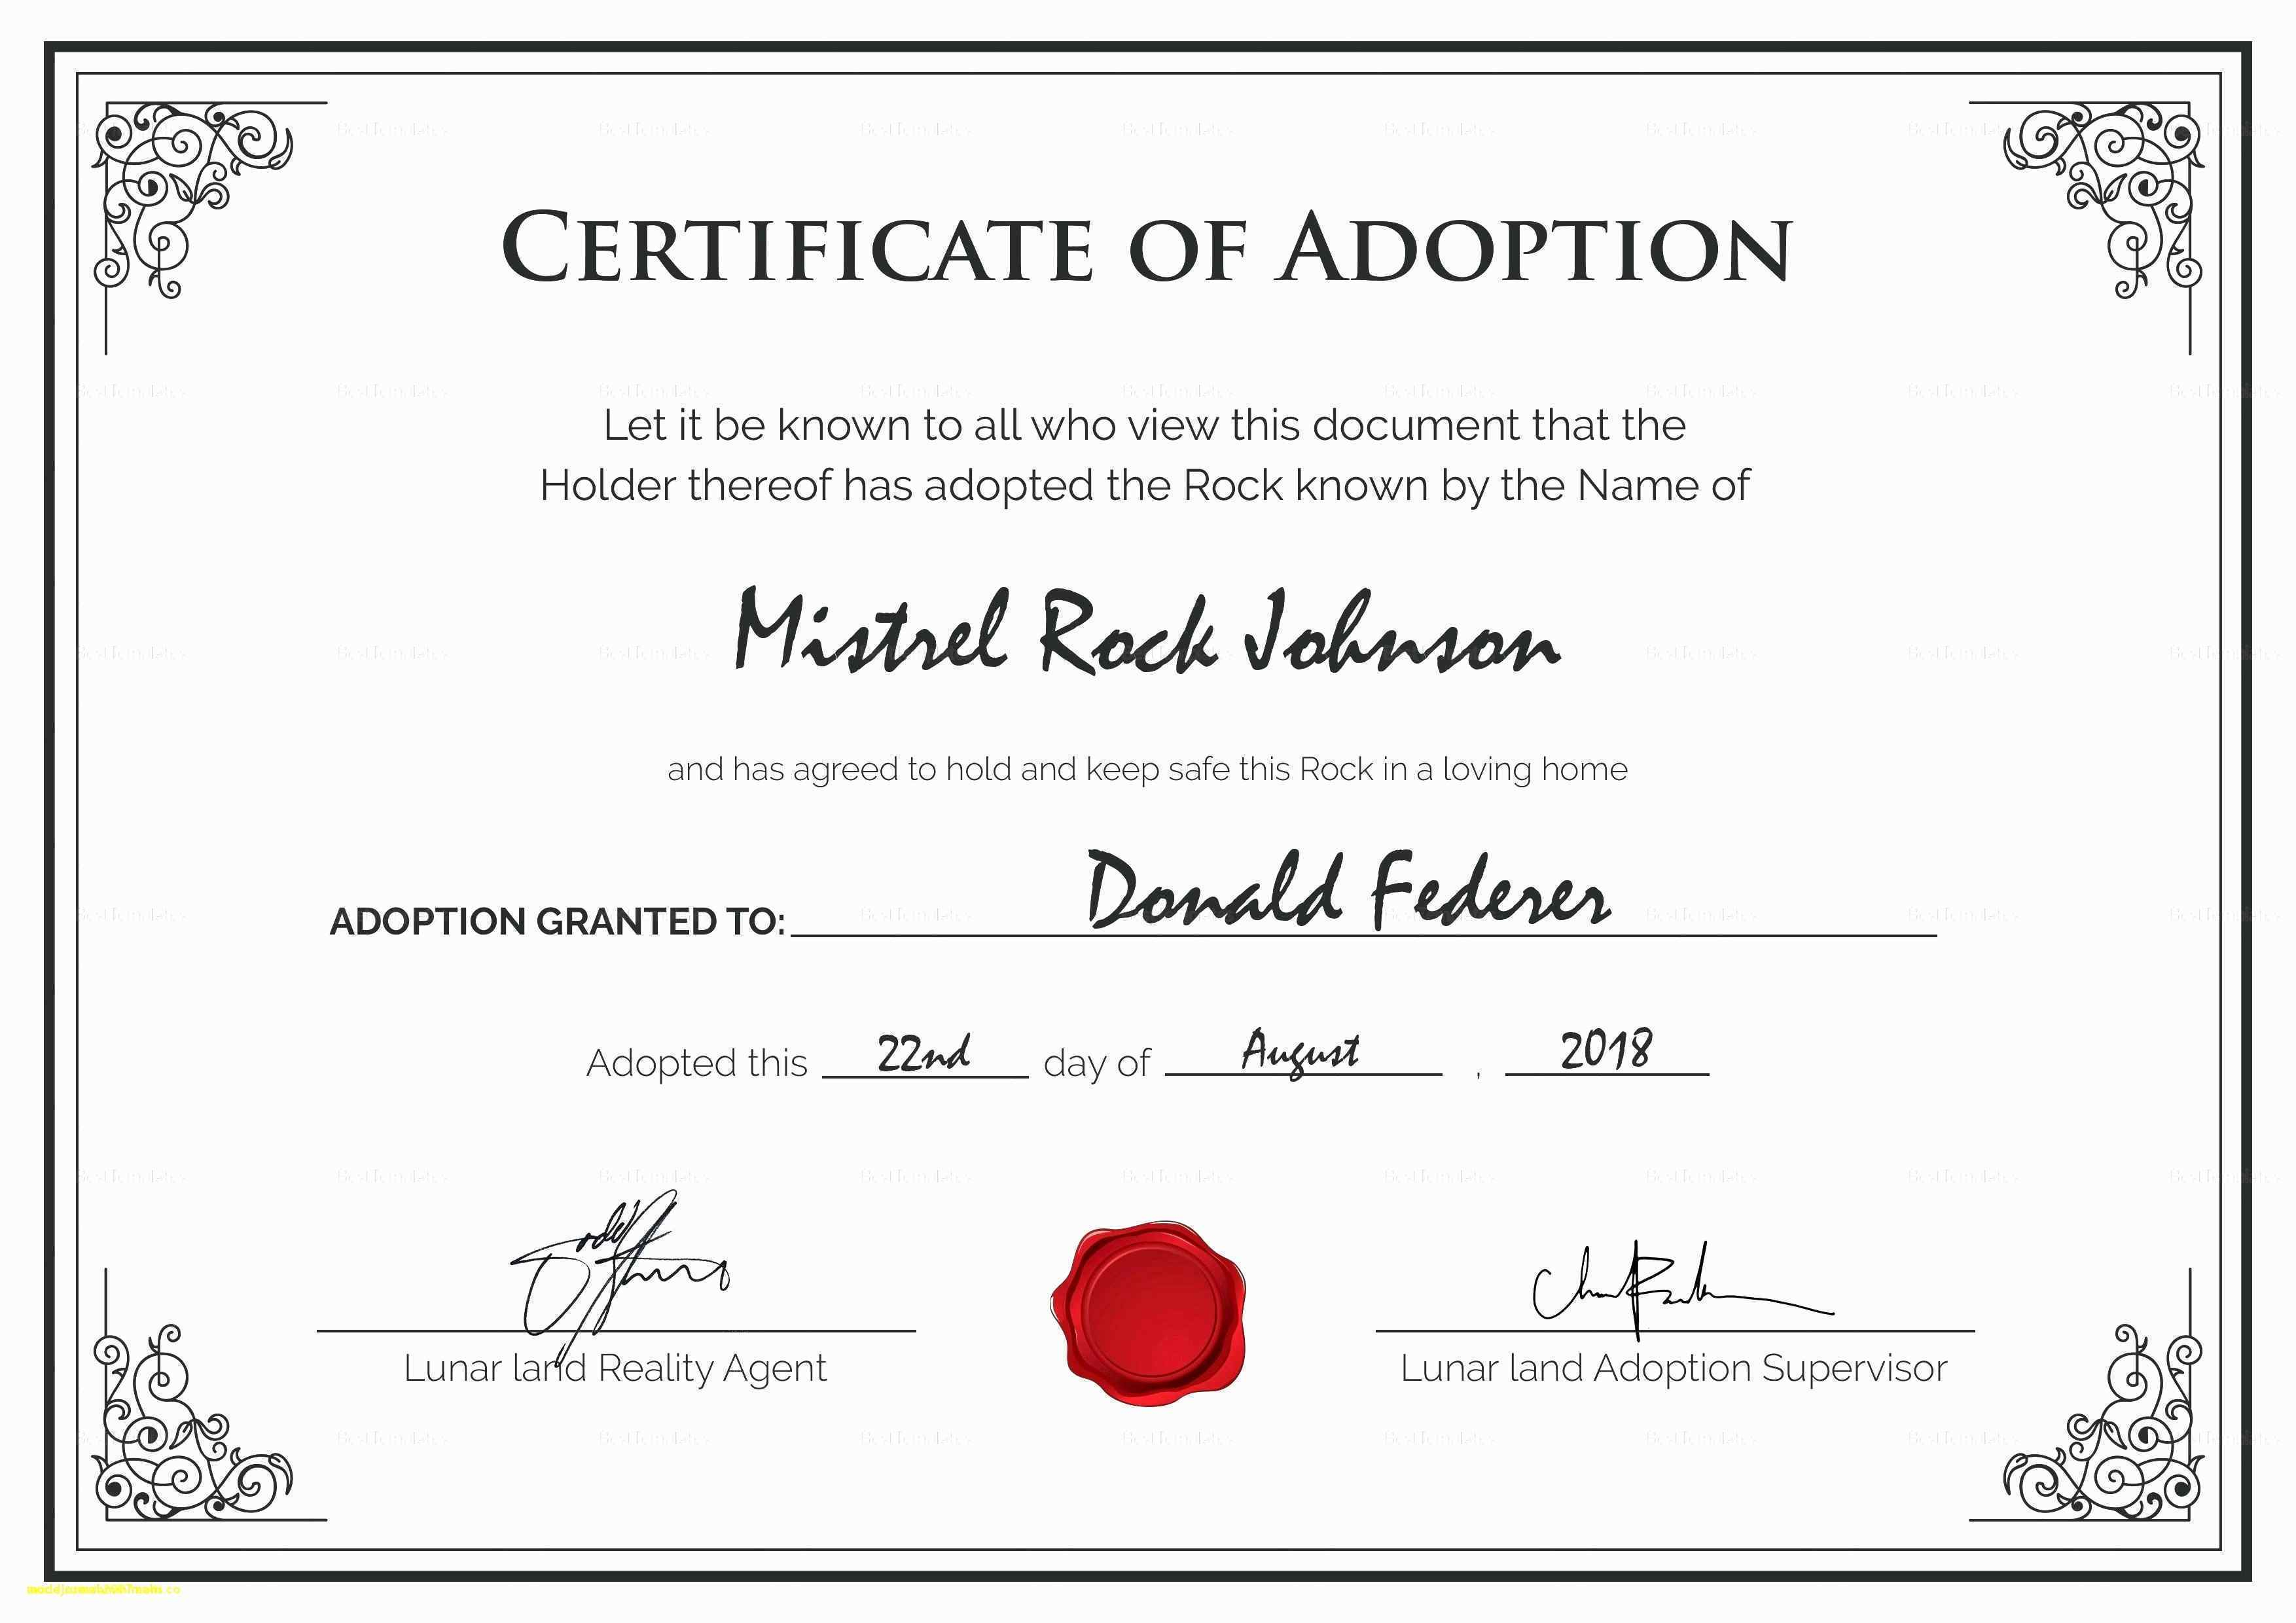 Fake Medical Certificate Template Lovely 25 Lovely Pics Fake - Fake Adoption Certificate Free Printable